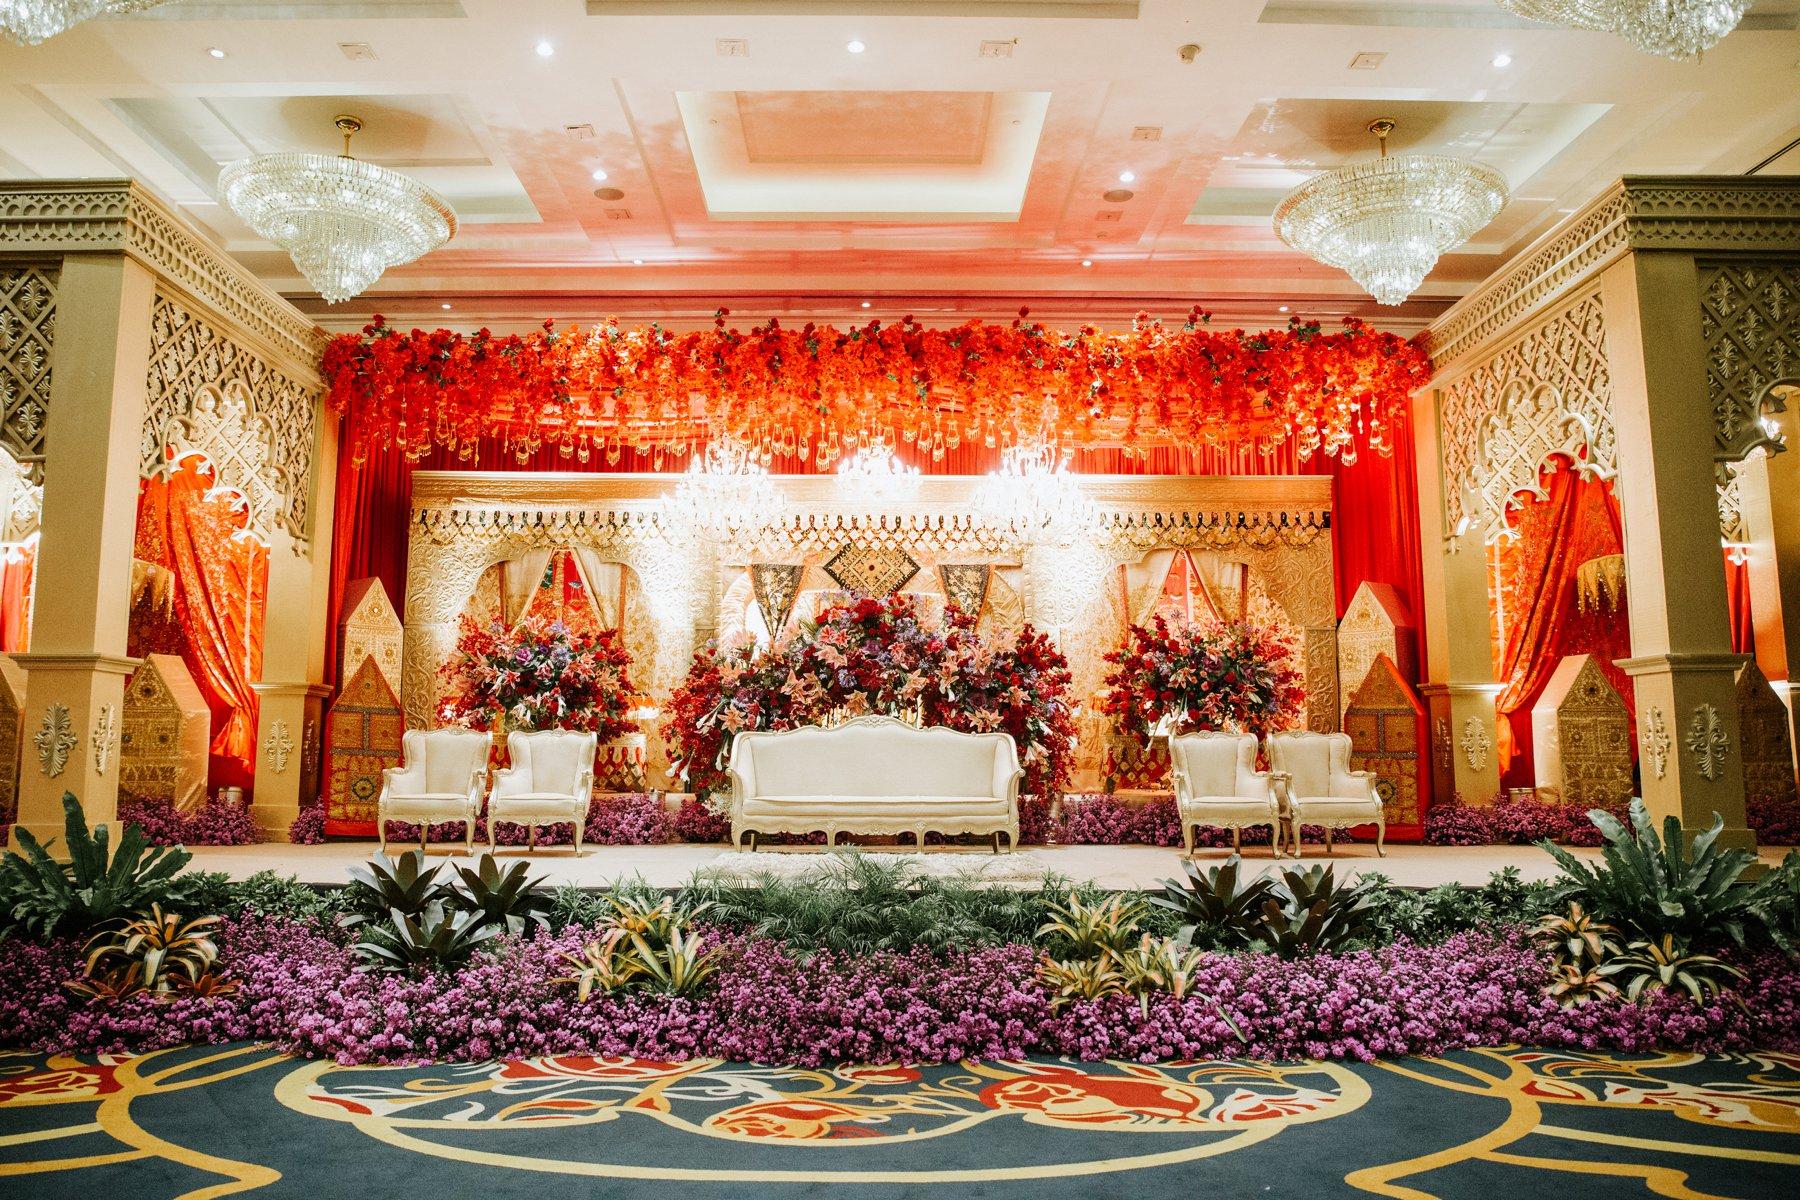 L royale bandung wedding tashya ivan antijitters photo same day edit film by antijitters photo junglespirit Image collections